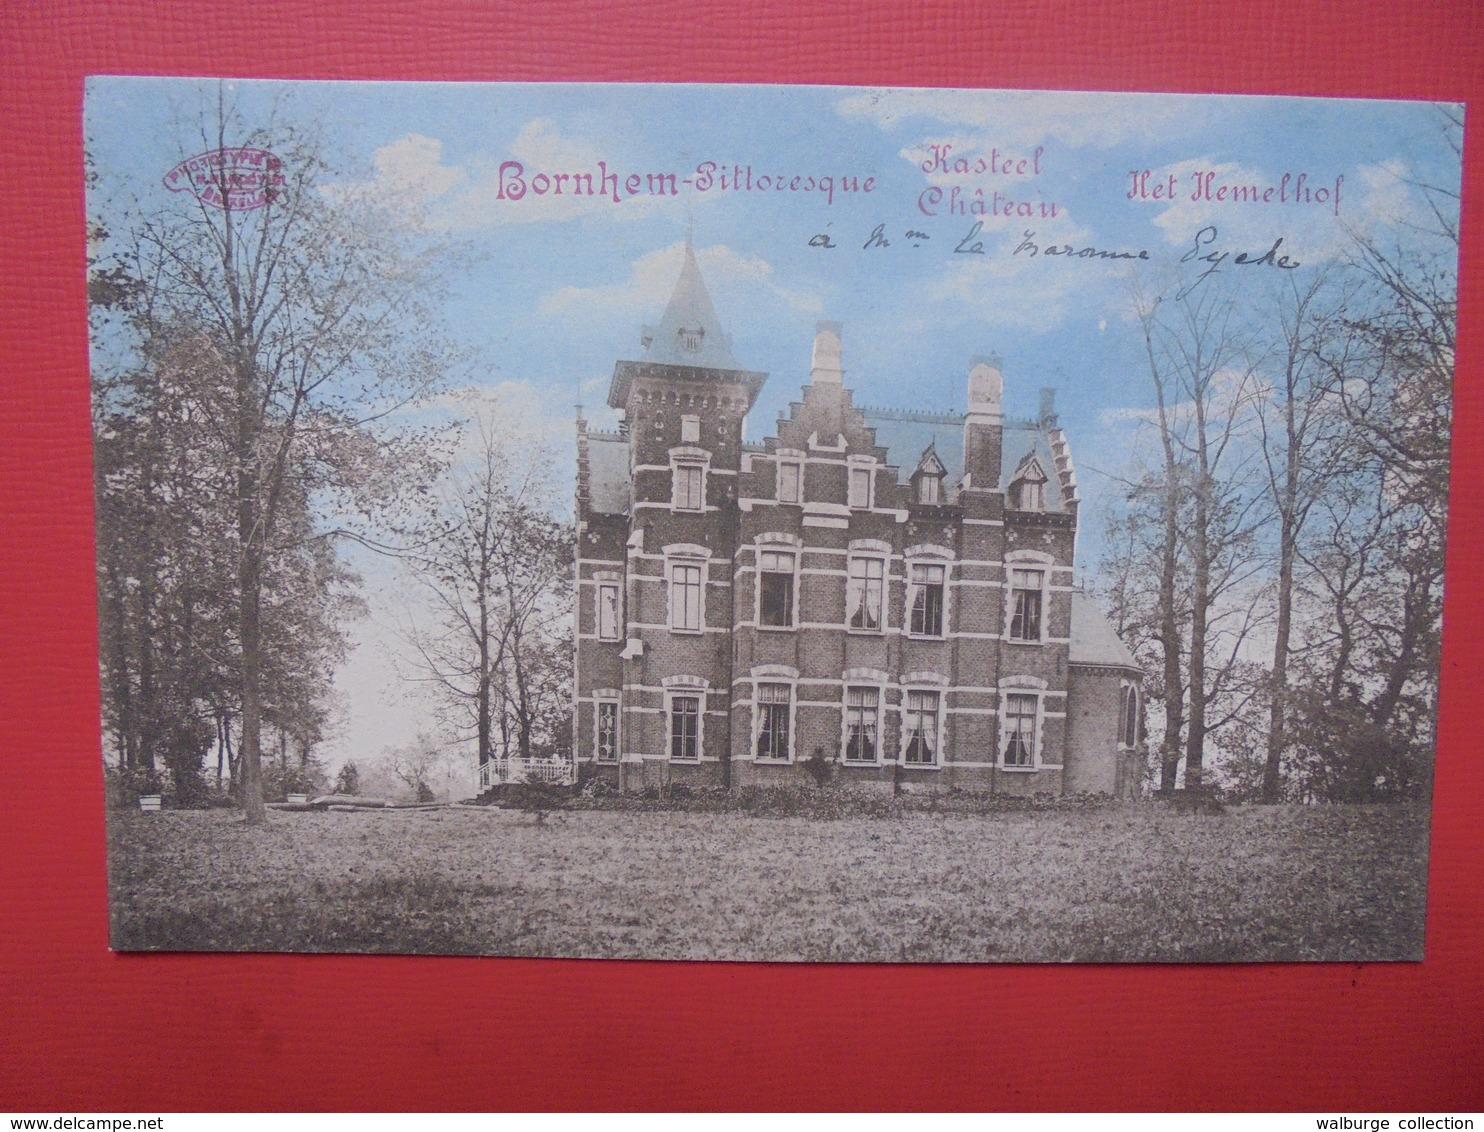 Bornem :Le Château Het Hemelhof (B284) - Bornem